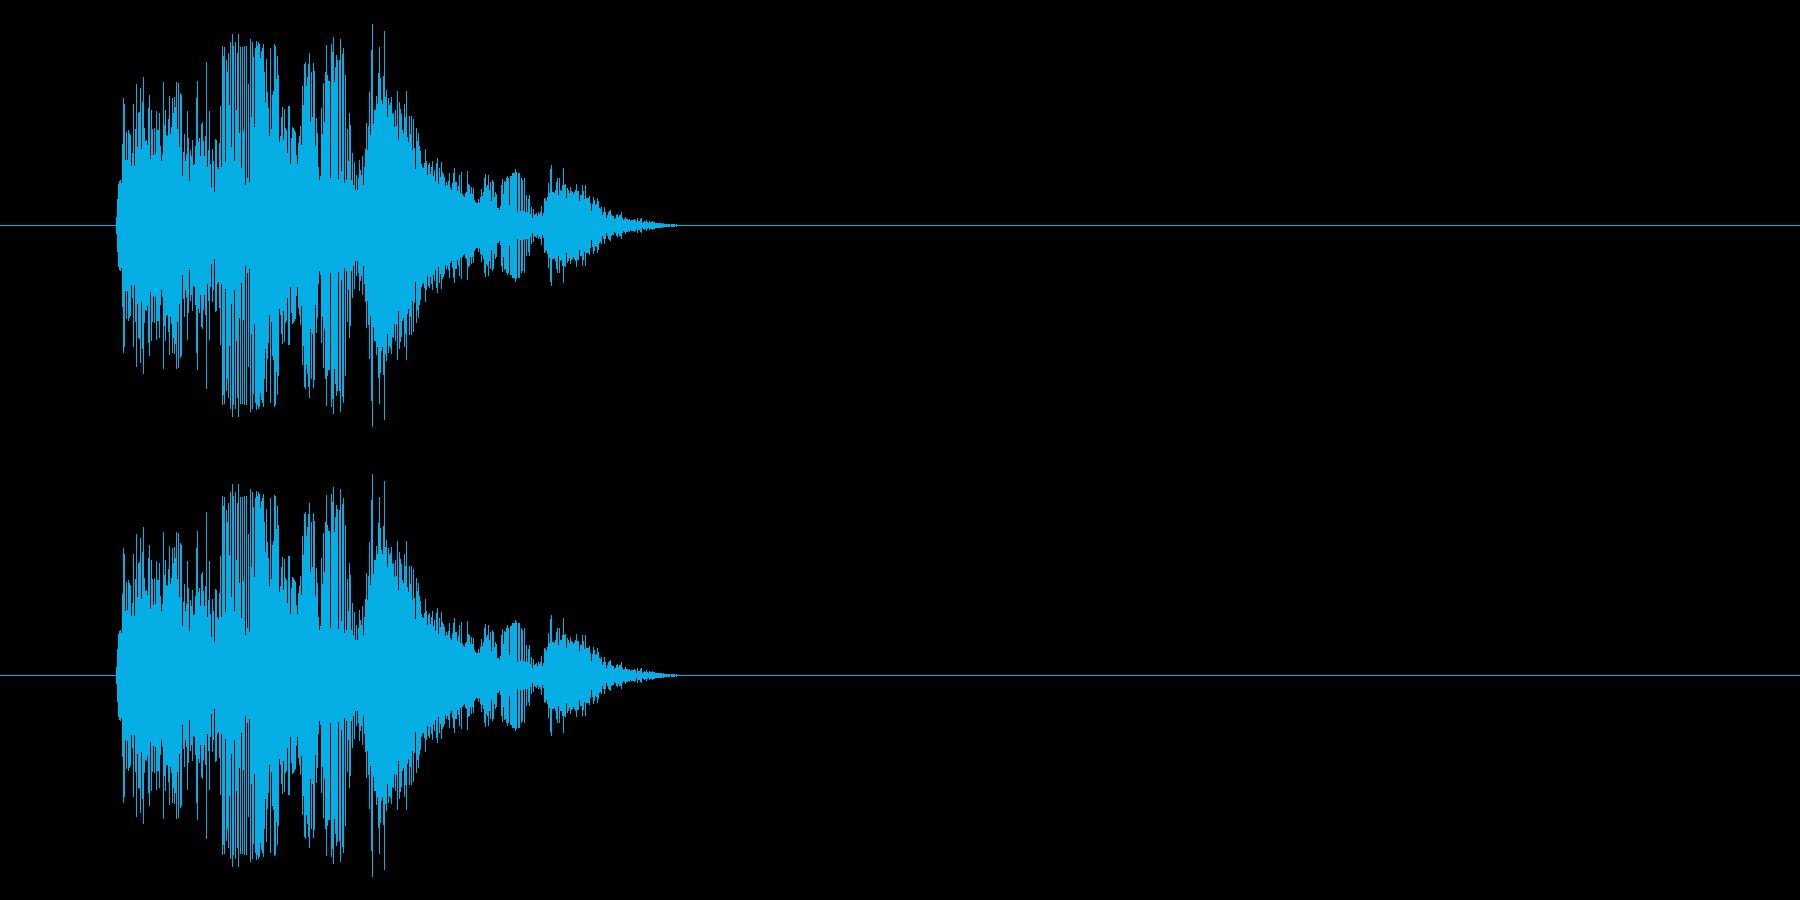 【NES RPG01-03(攻撃)】の再生済みの波形